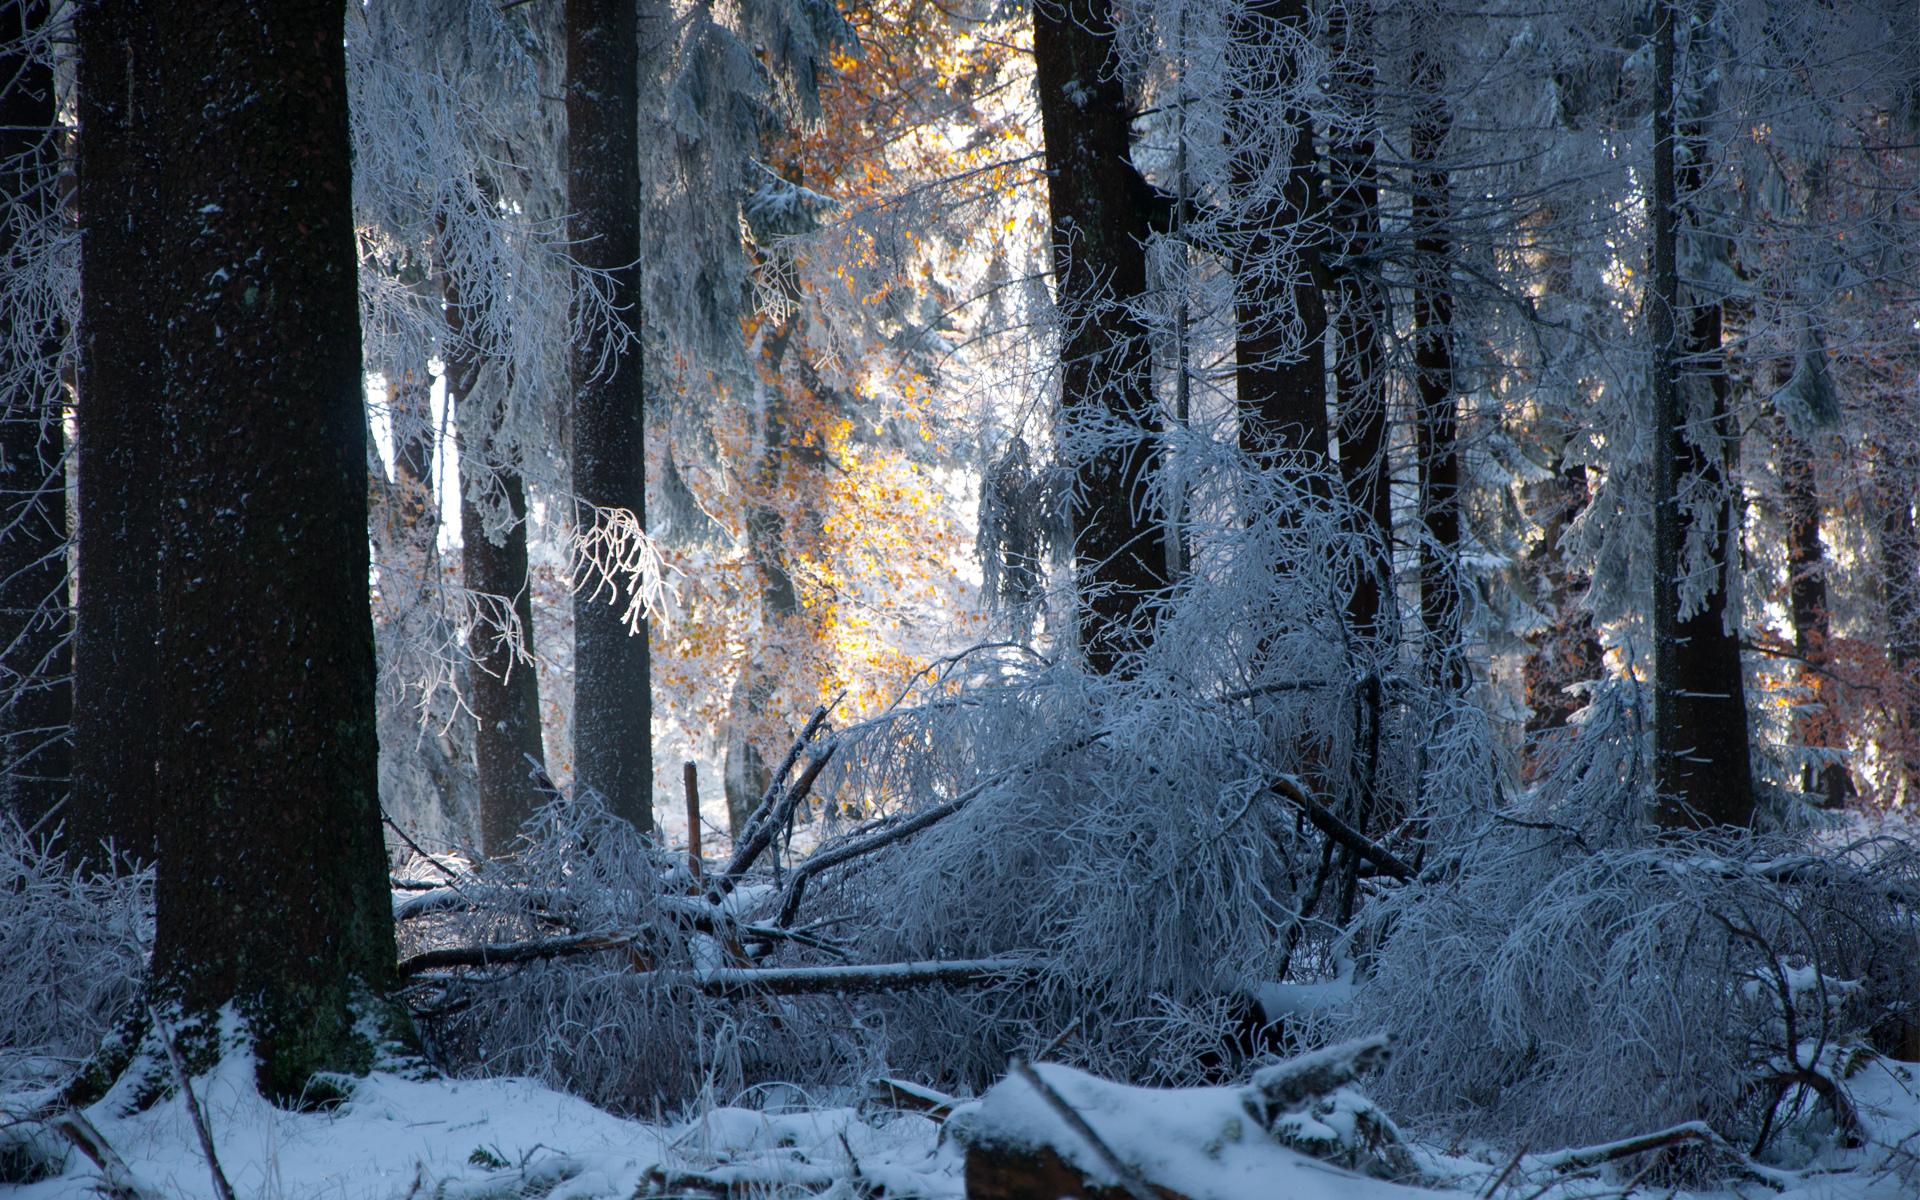 Www Wallpaper Com Free Download Hd Snow Forest Trees Winter Sunlight Light Frost Landscapes